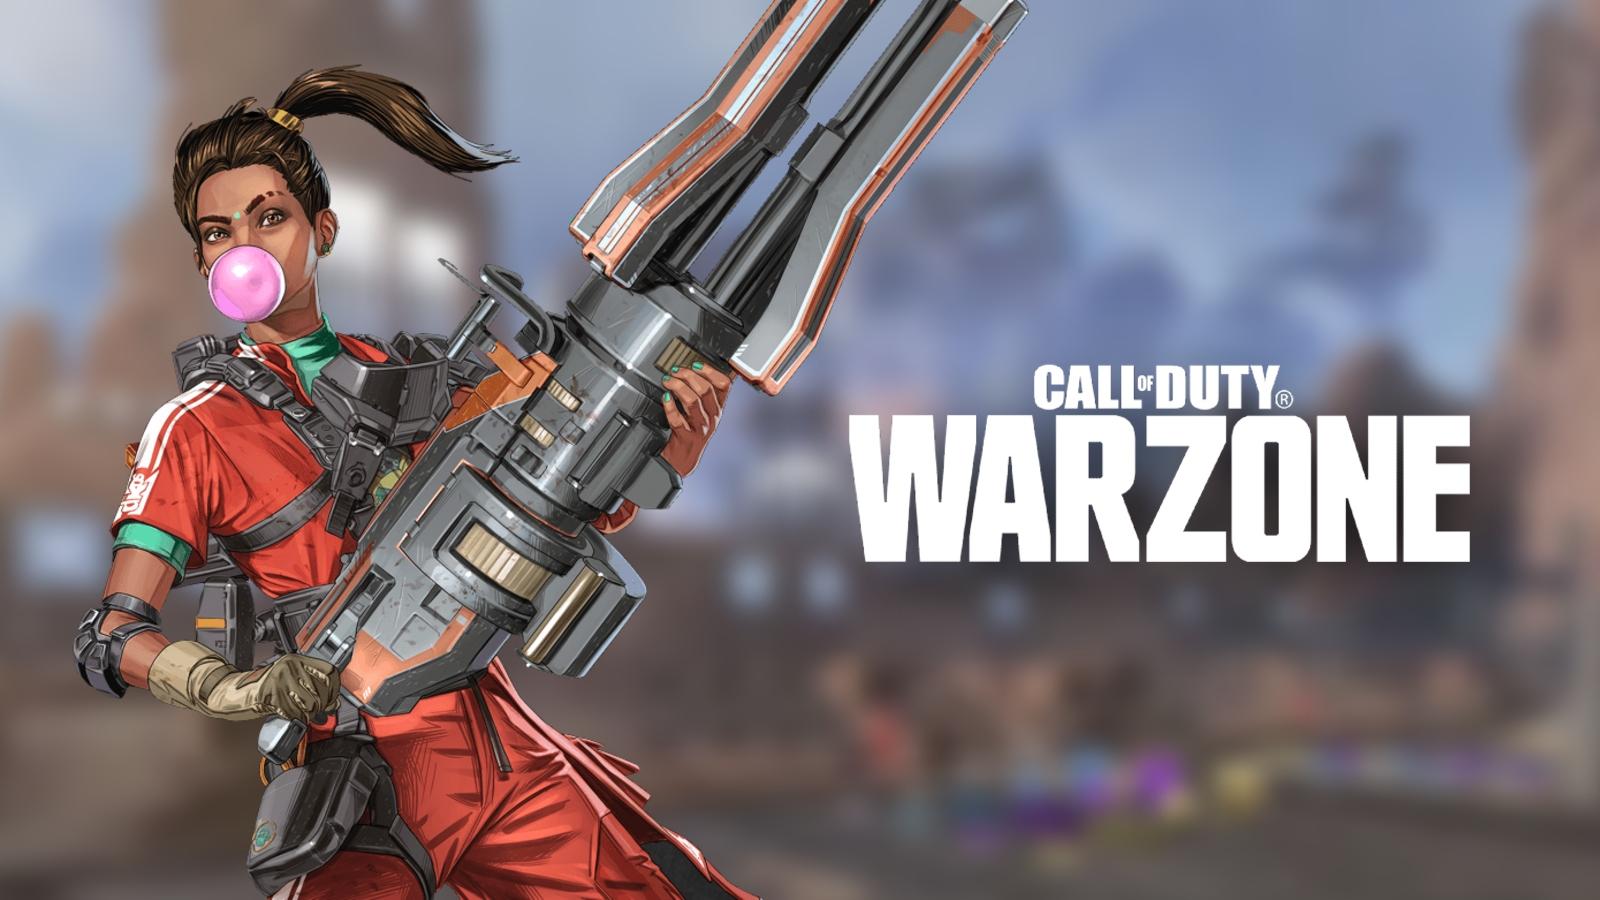 Warzone rampart apex legends feature